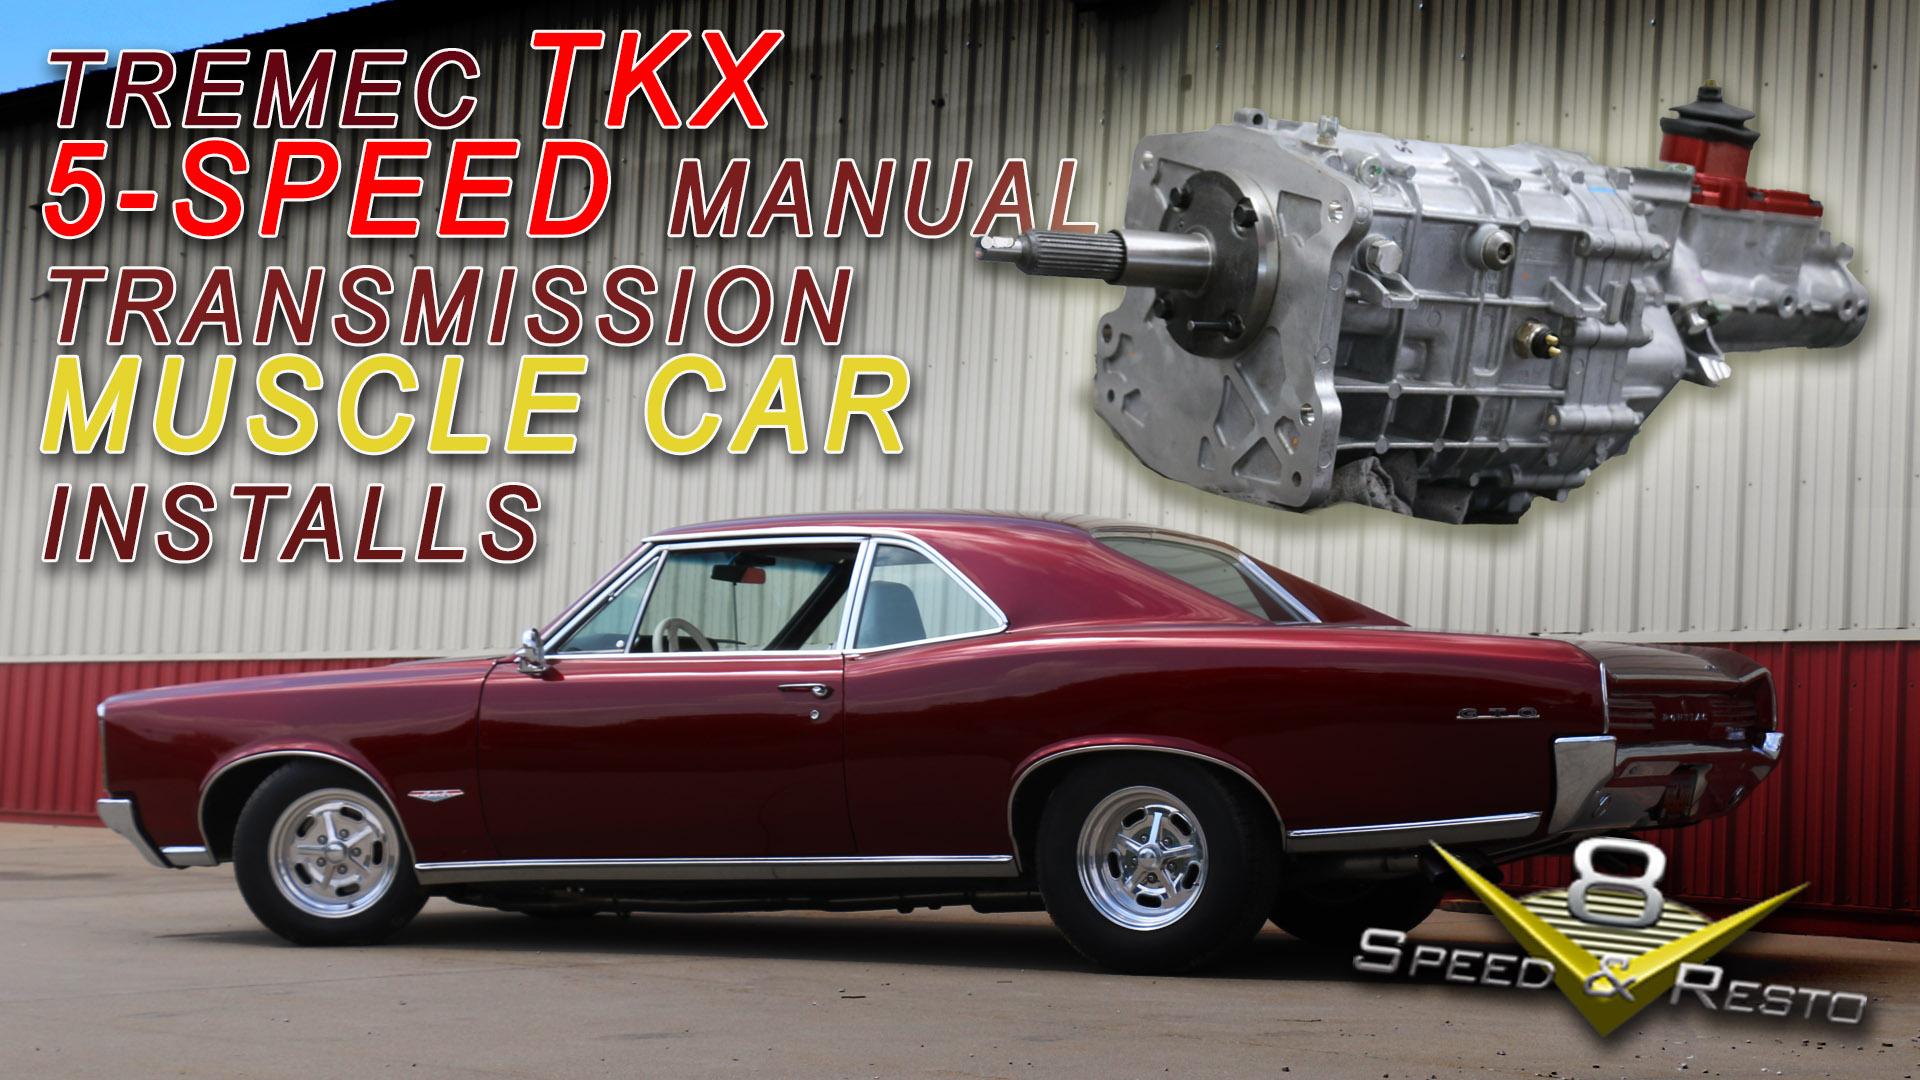 Tremec TKX 5-Speed Manual Transmission Conversion at V8 Speed and Resto Shop